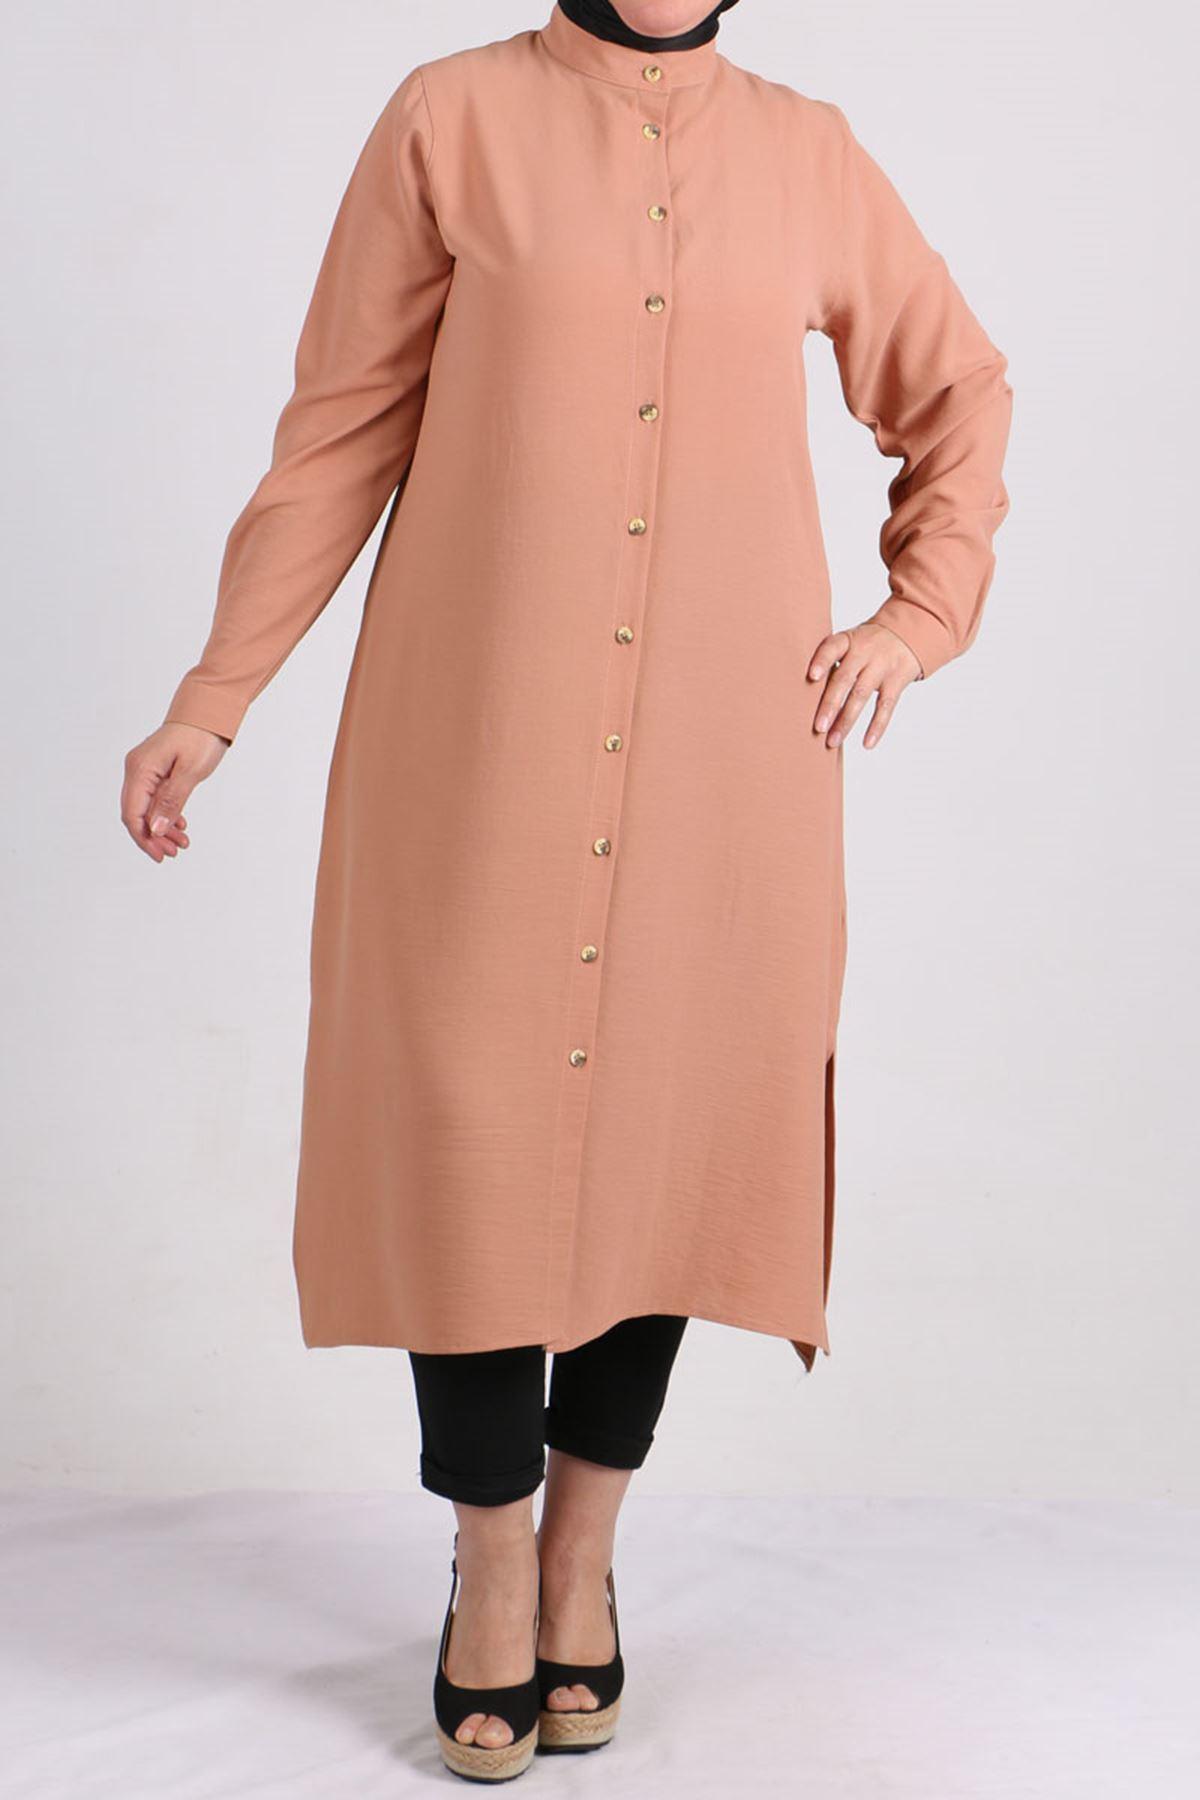 8401 Oversize Buttoned Shirt - Salmon